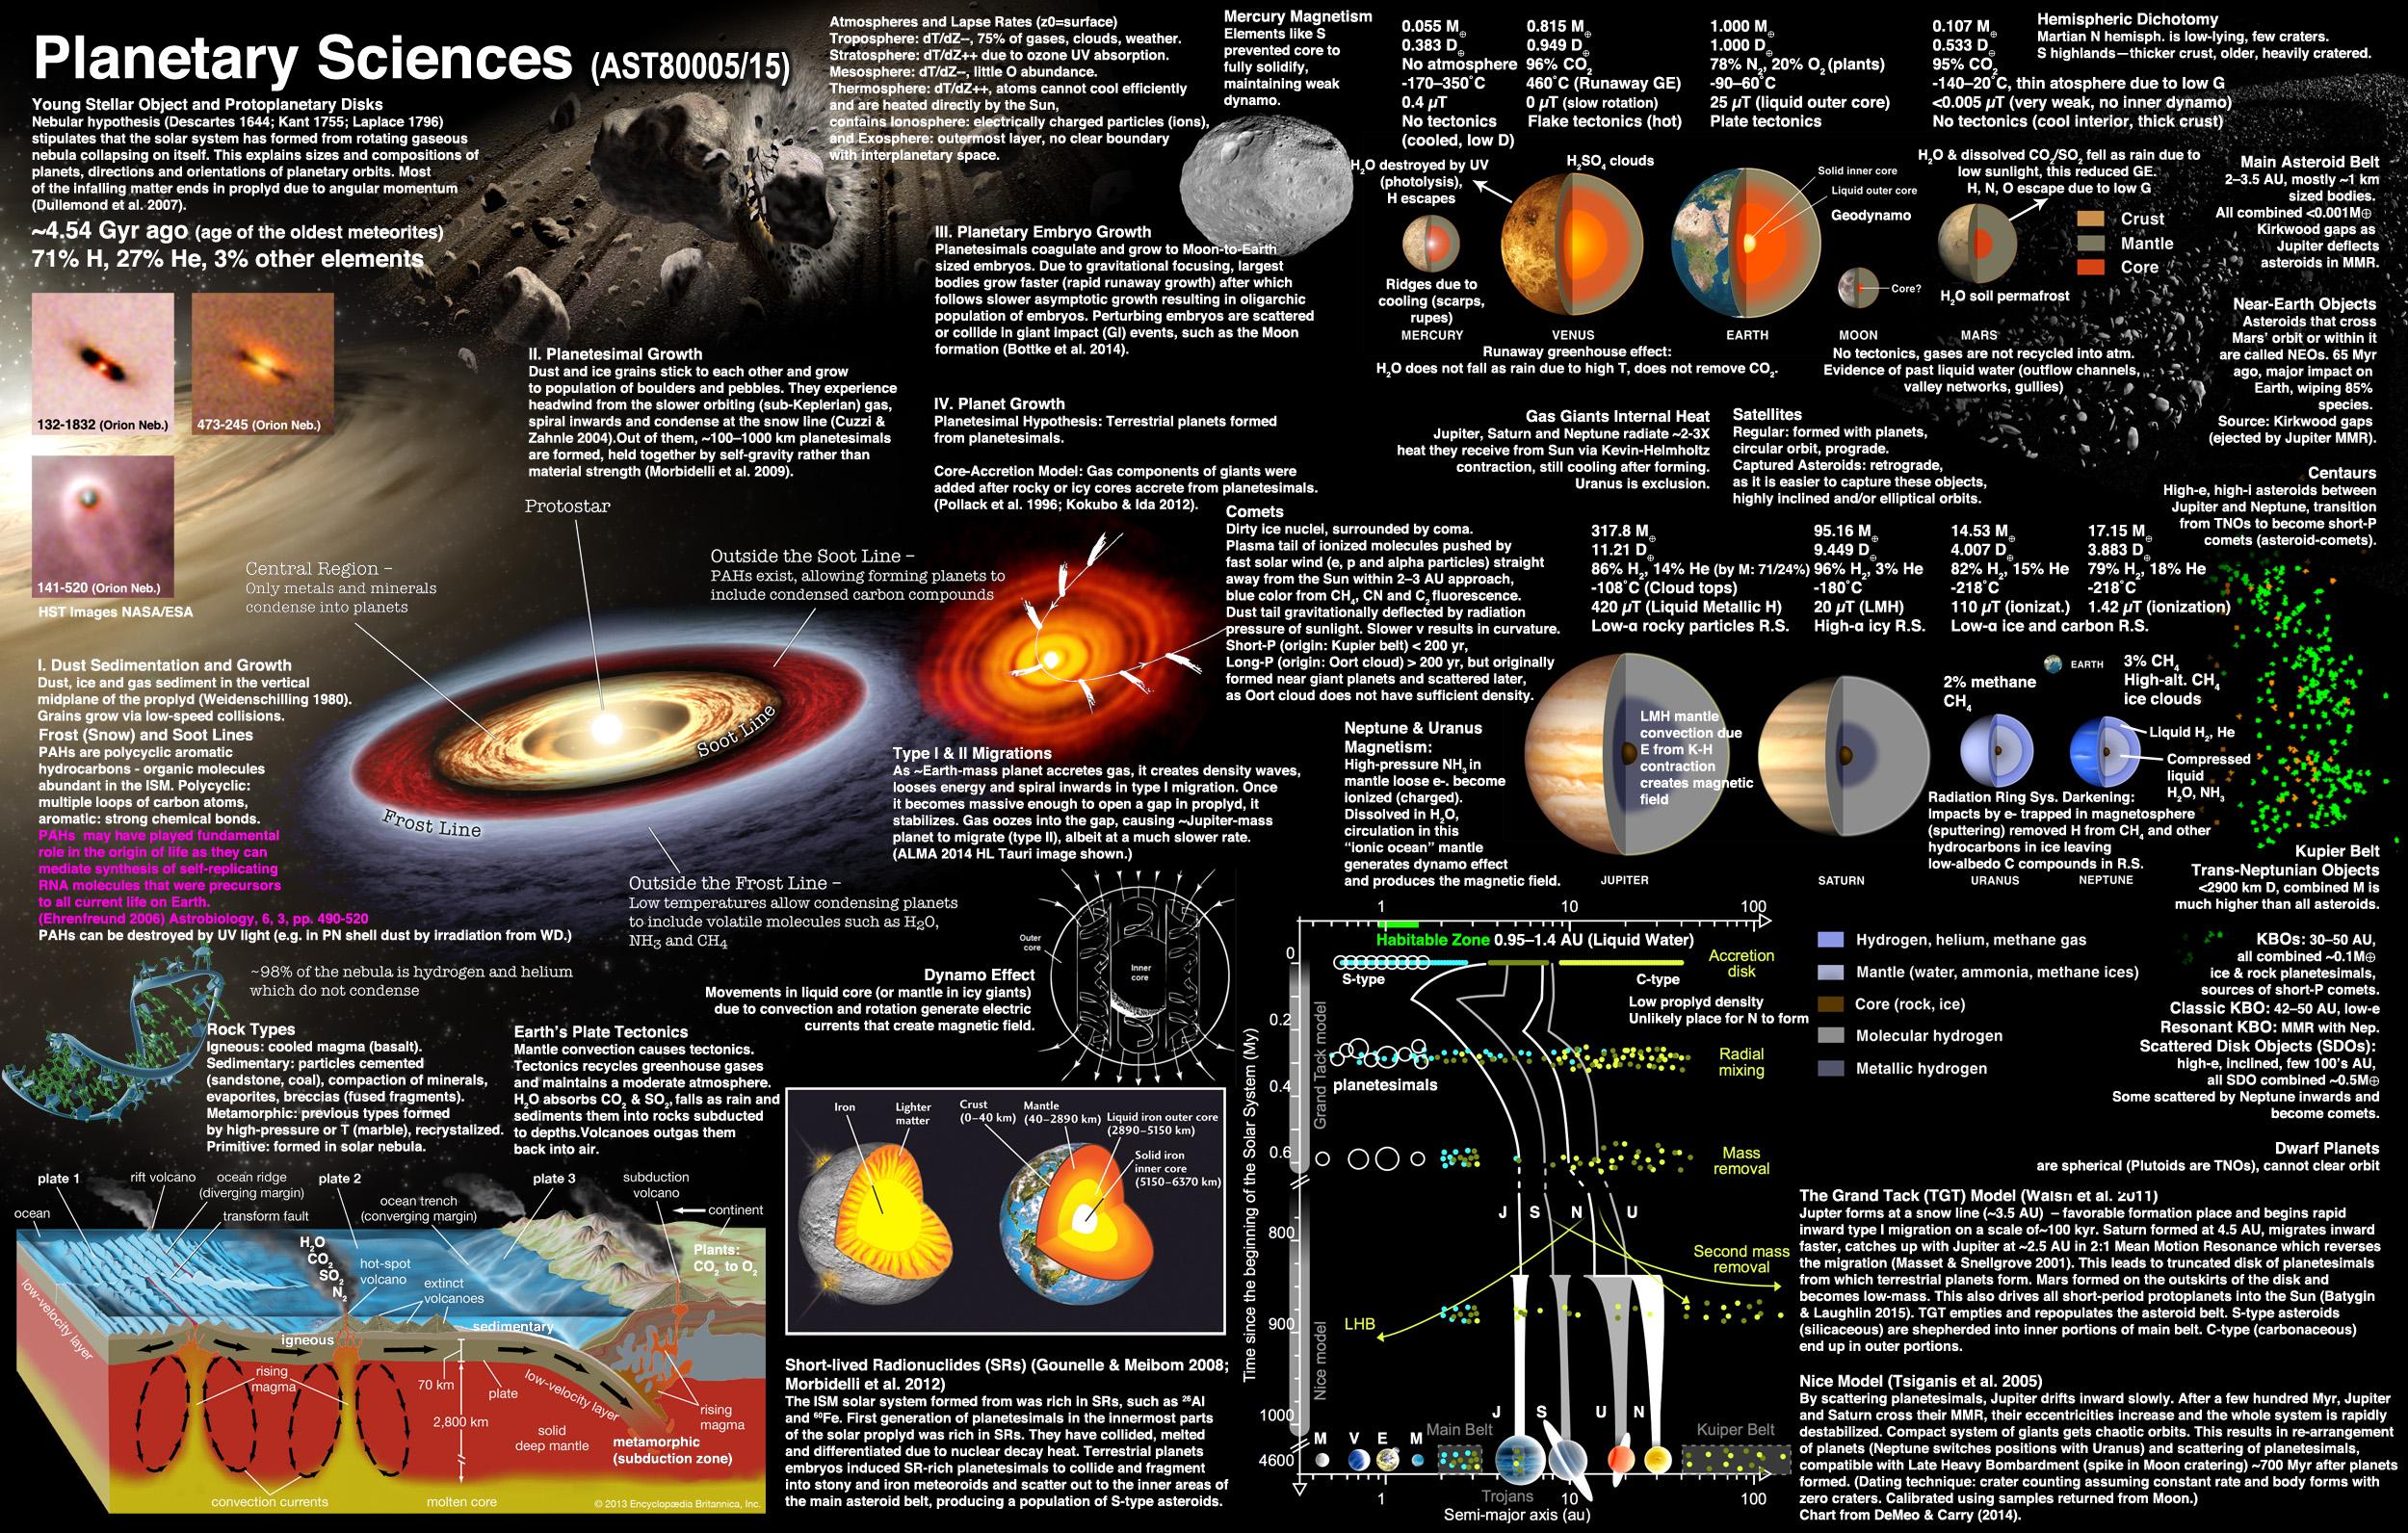 030216-solar-system